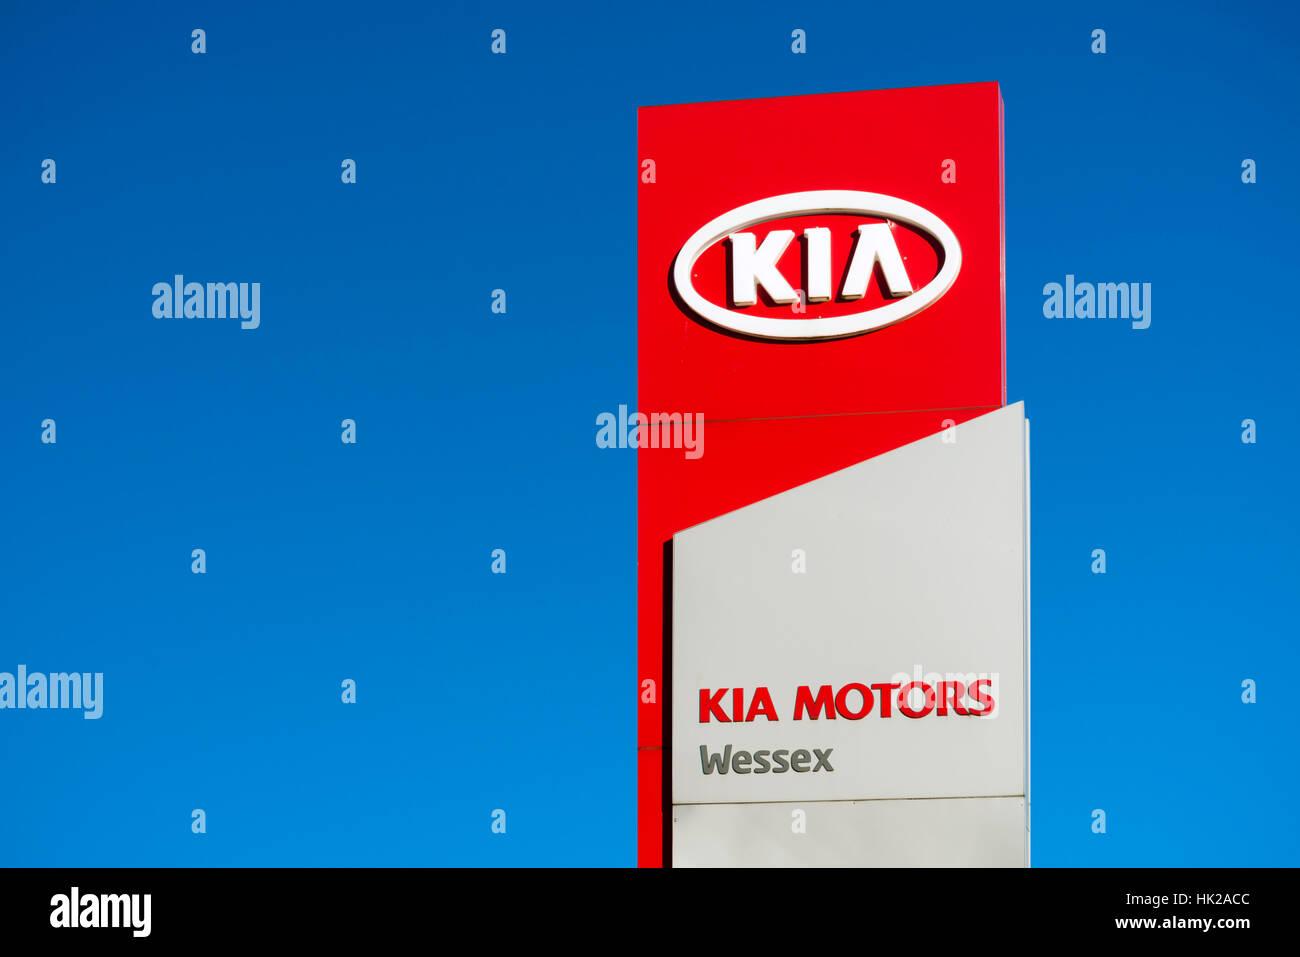 Kia motors sign, UK. - Stock Image